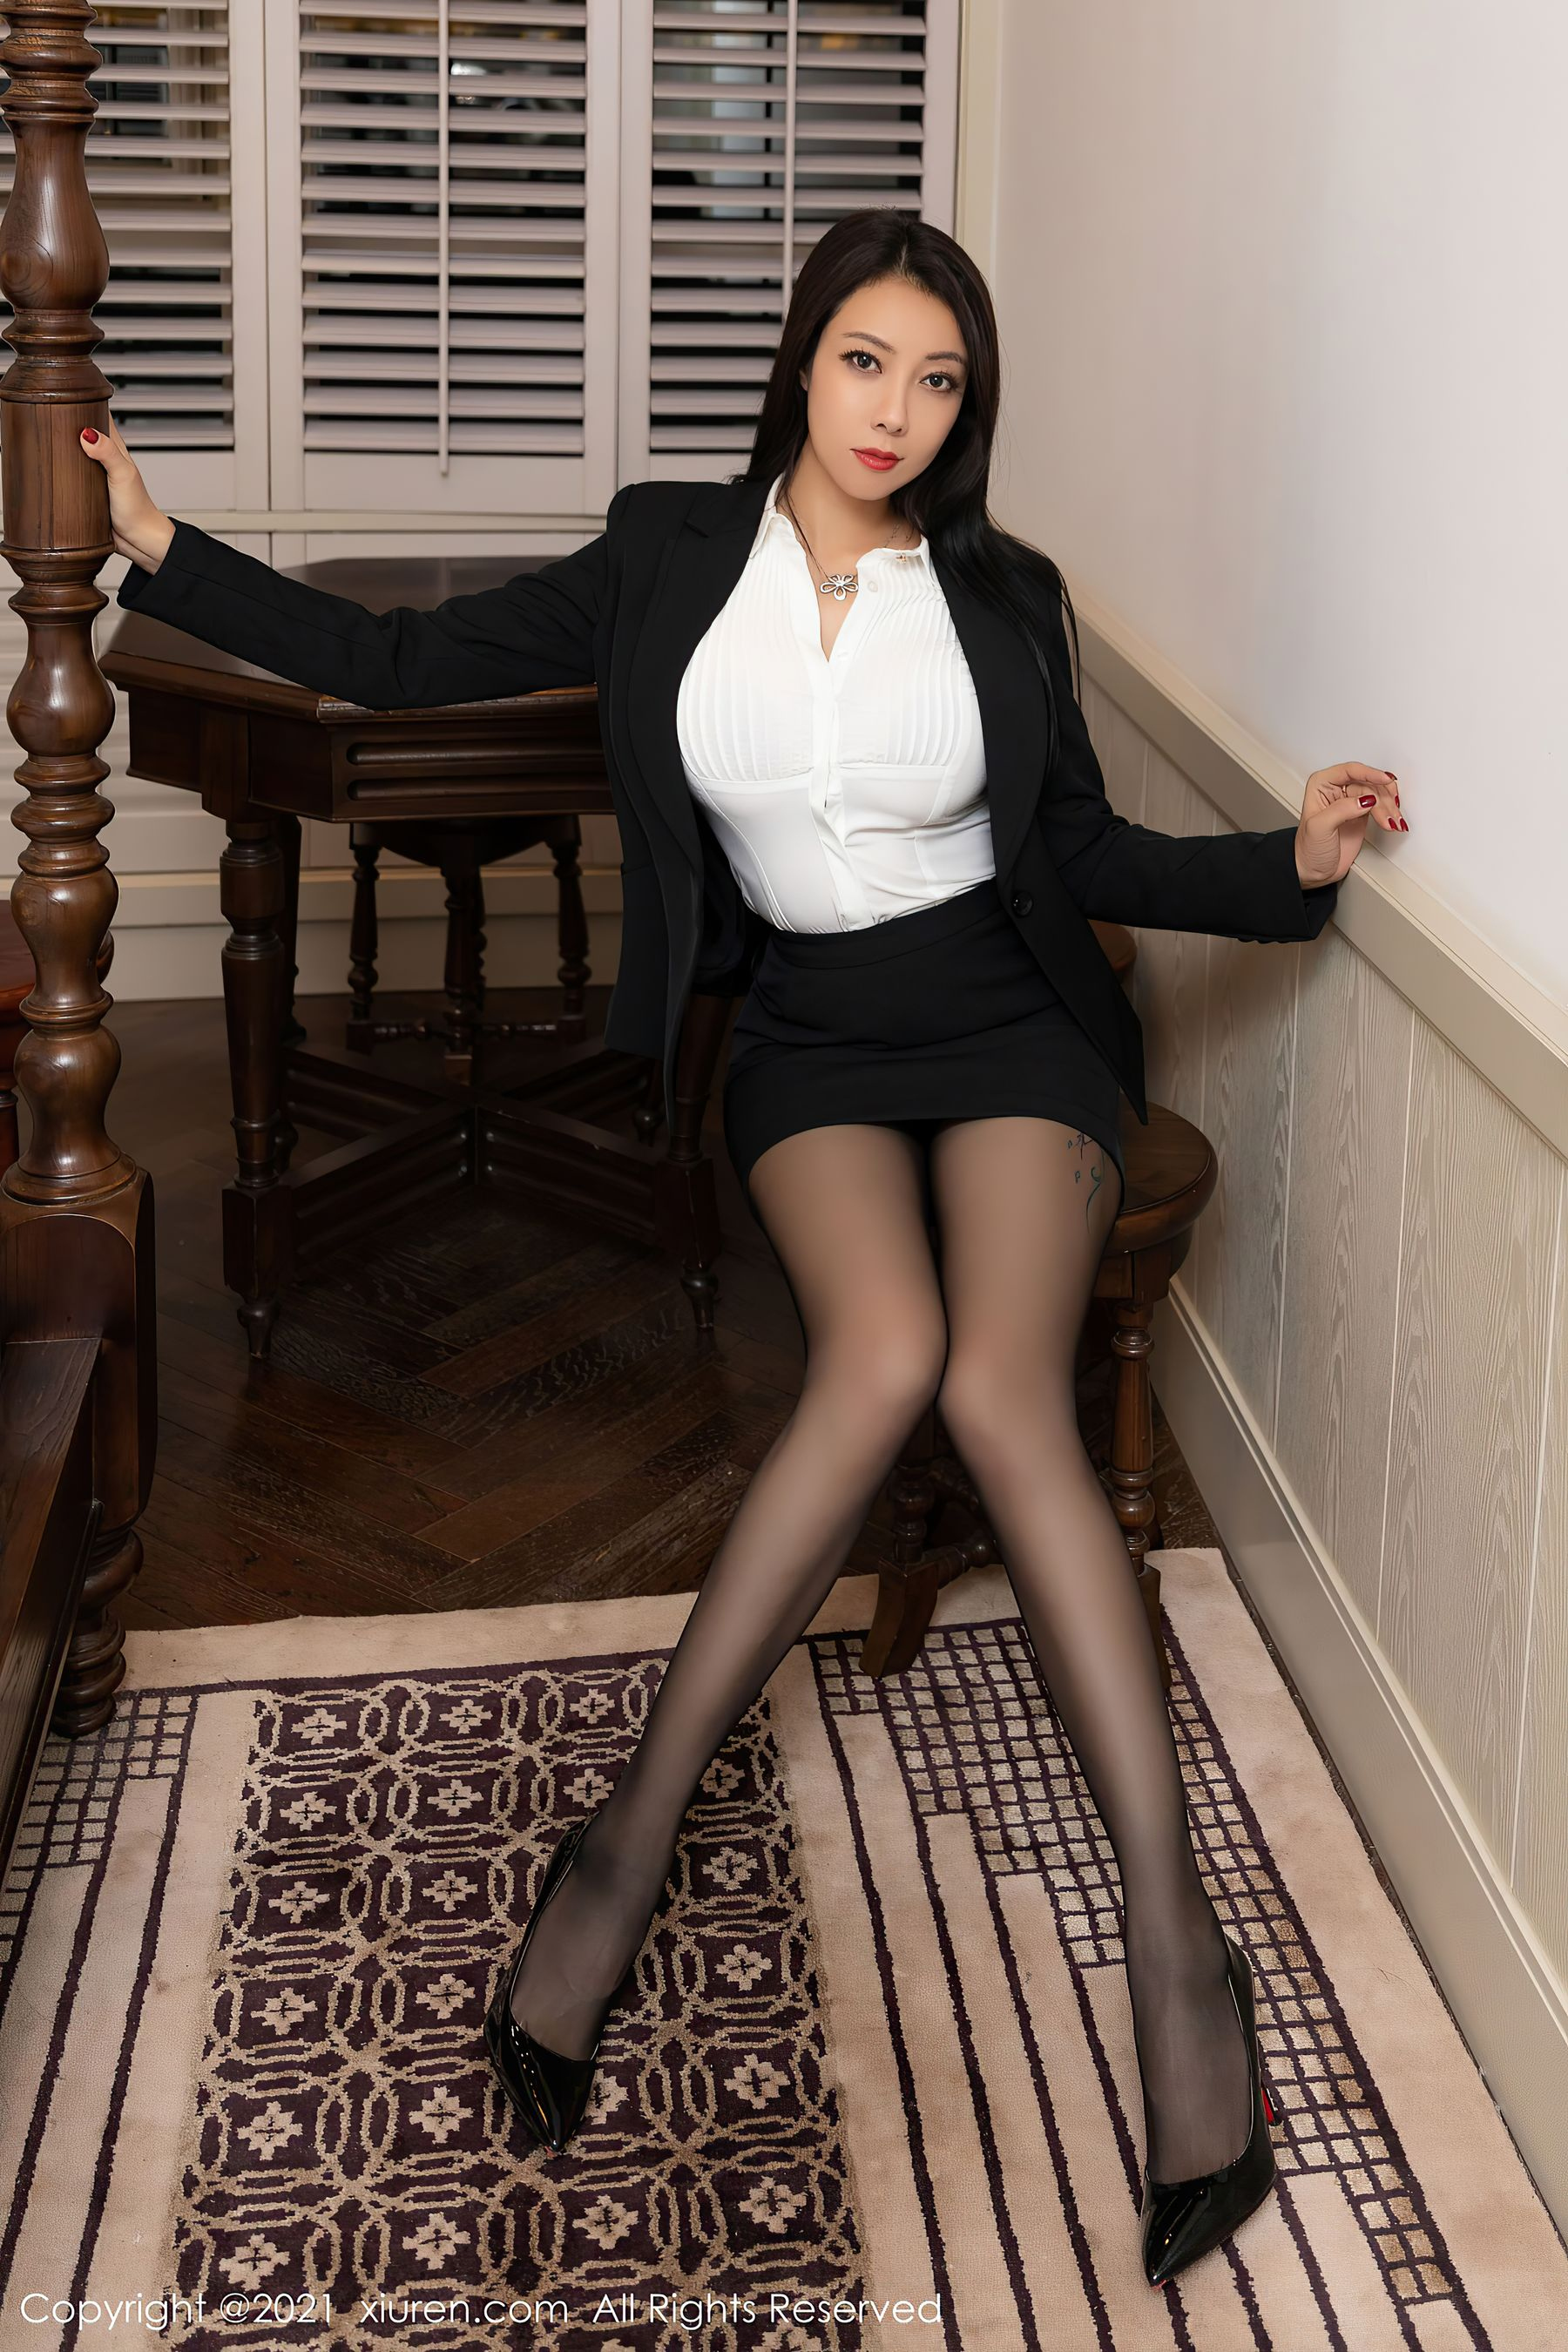 VOL.971 [秀人网]OL美女黑丝美腿黑丝诱惑:松果儿(闫雪松)超高清写真套图(58P)